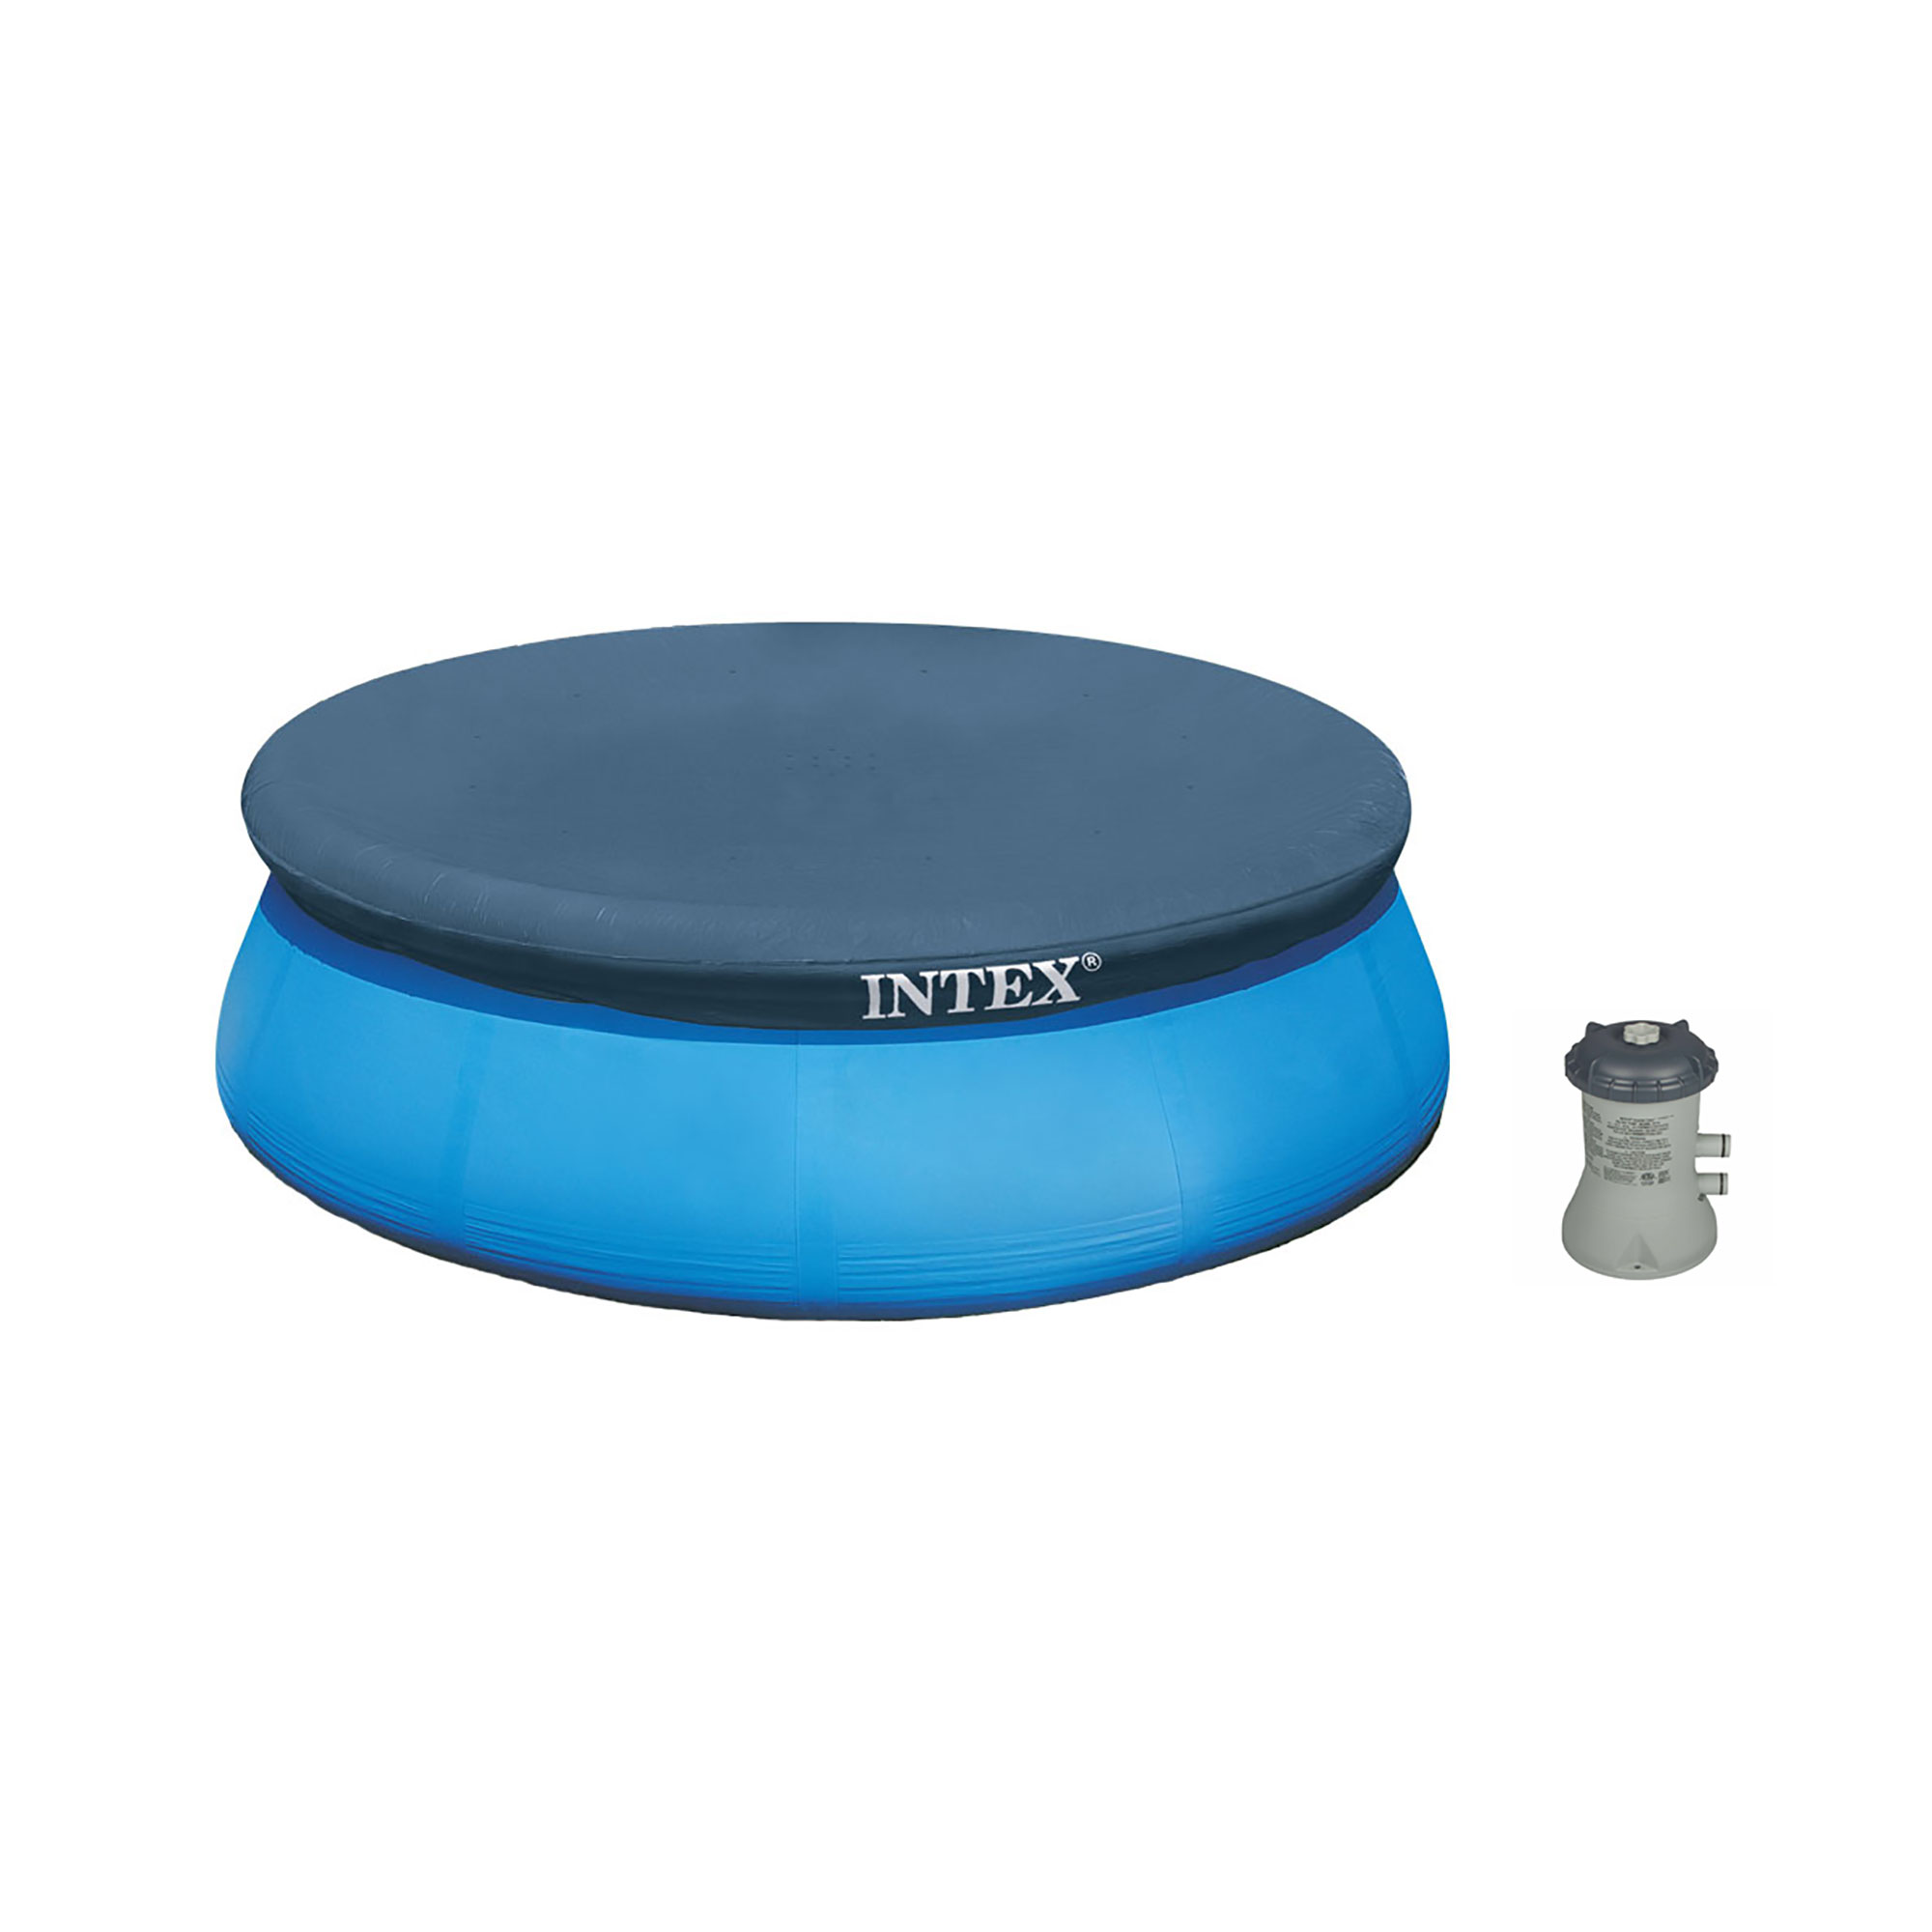 Intex above ground swimming pool cartridge filter pump - Swimming pool cartridge filters pump ...